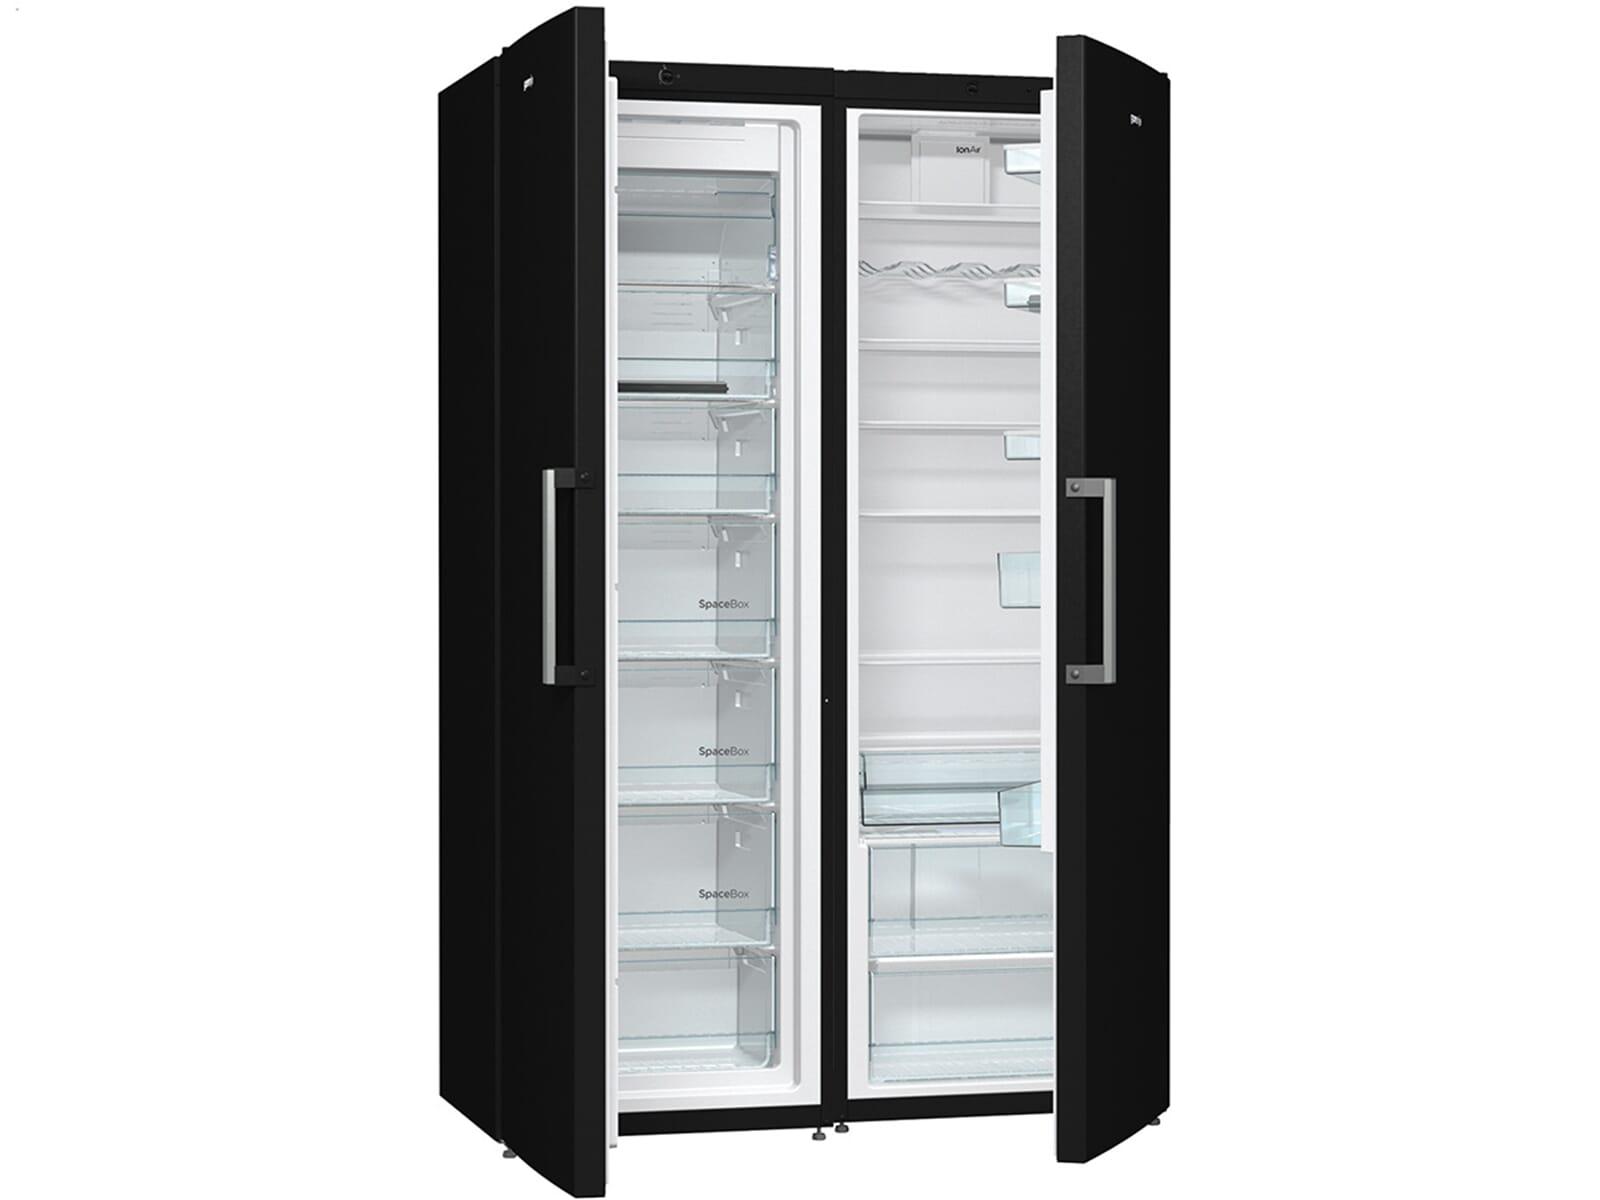 Gorenje Kühlschrank Friert : Gorenje sbs cfbk side by side kühl gefrier kombination black